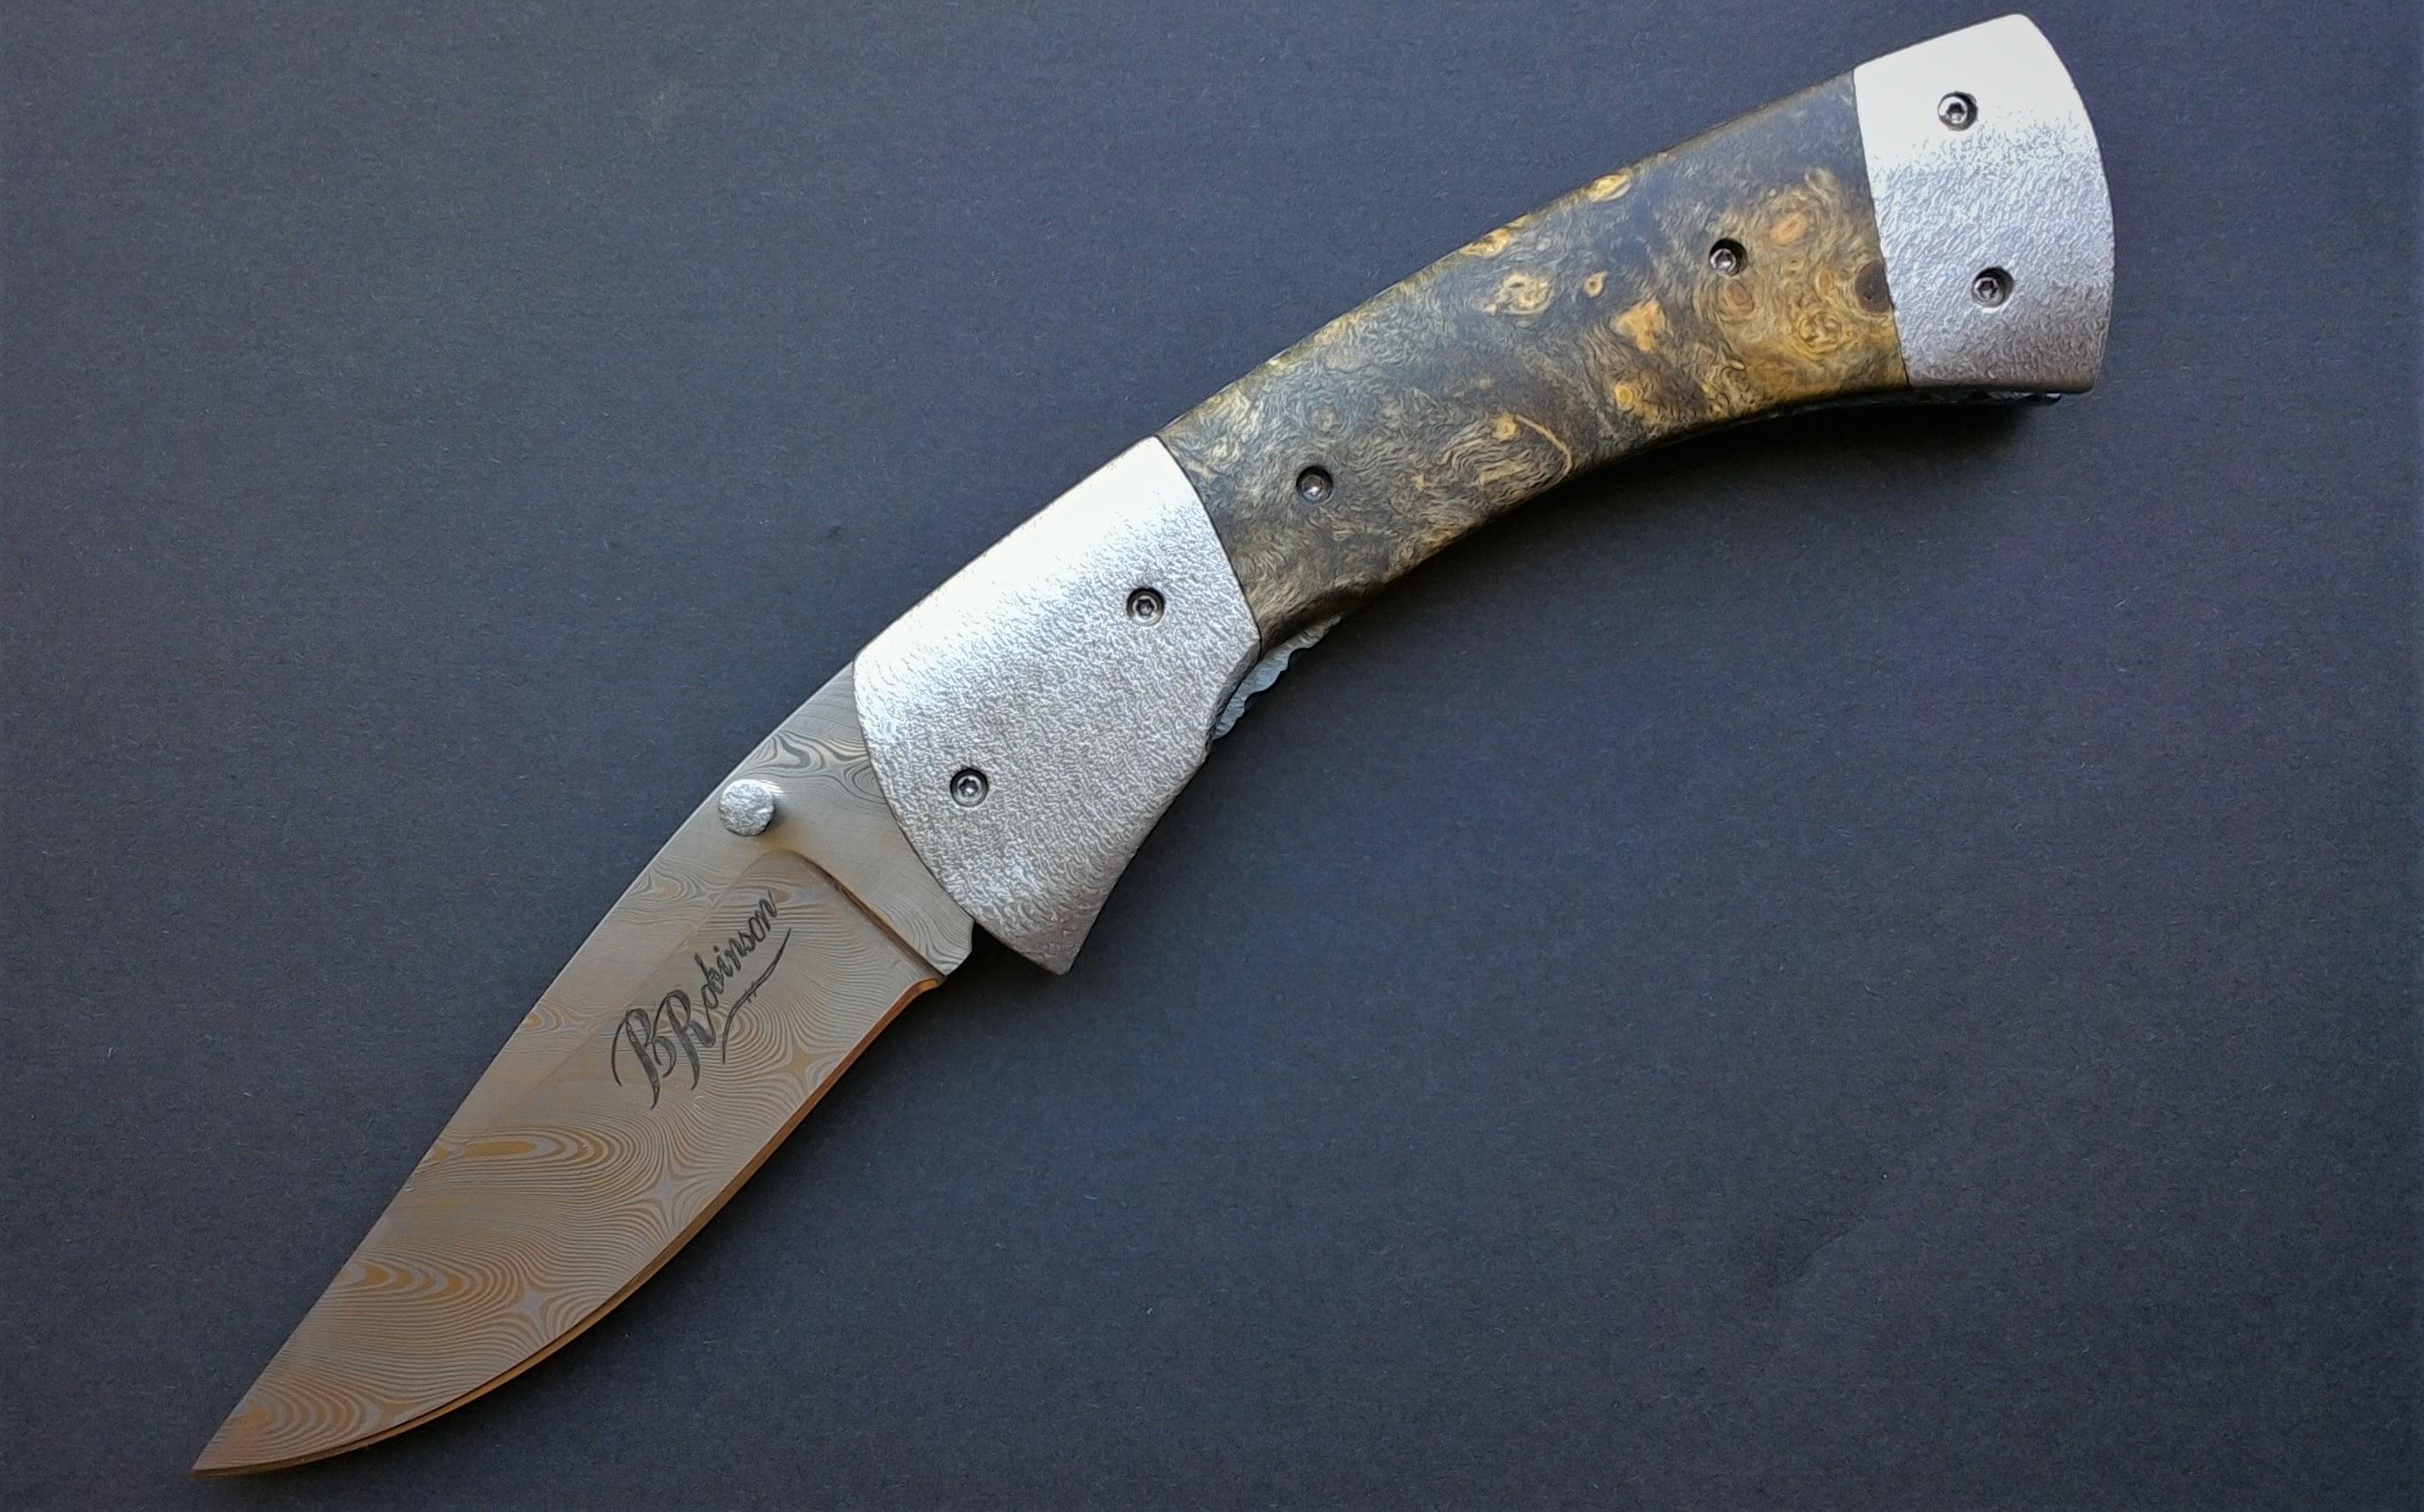 alibaba damascus knives pakistan suppliers laguiole wholesale sheath with leather jaguar showroom knife